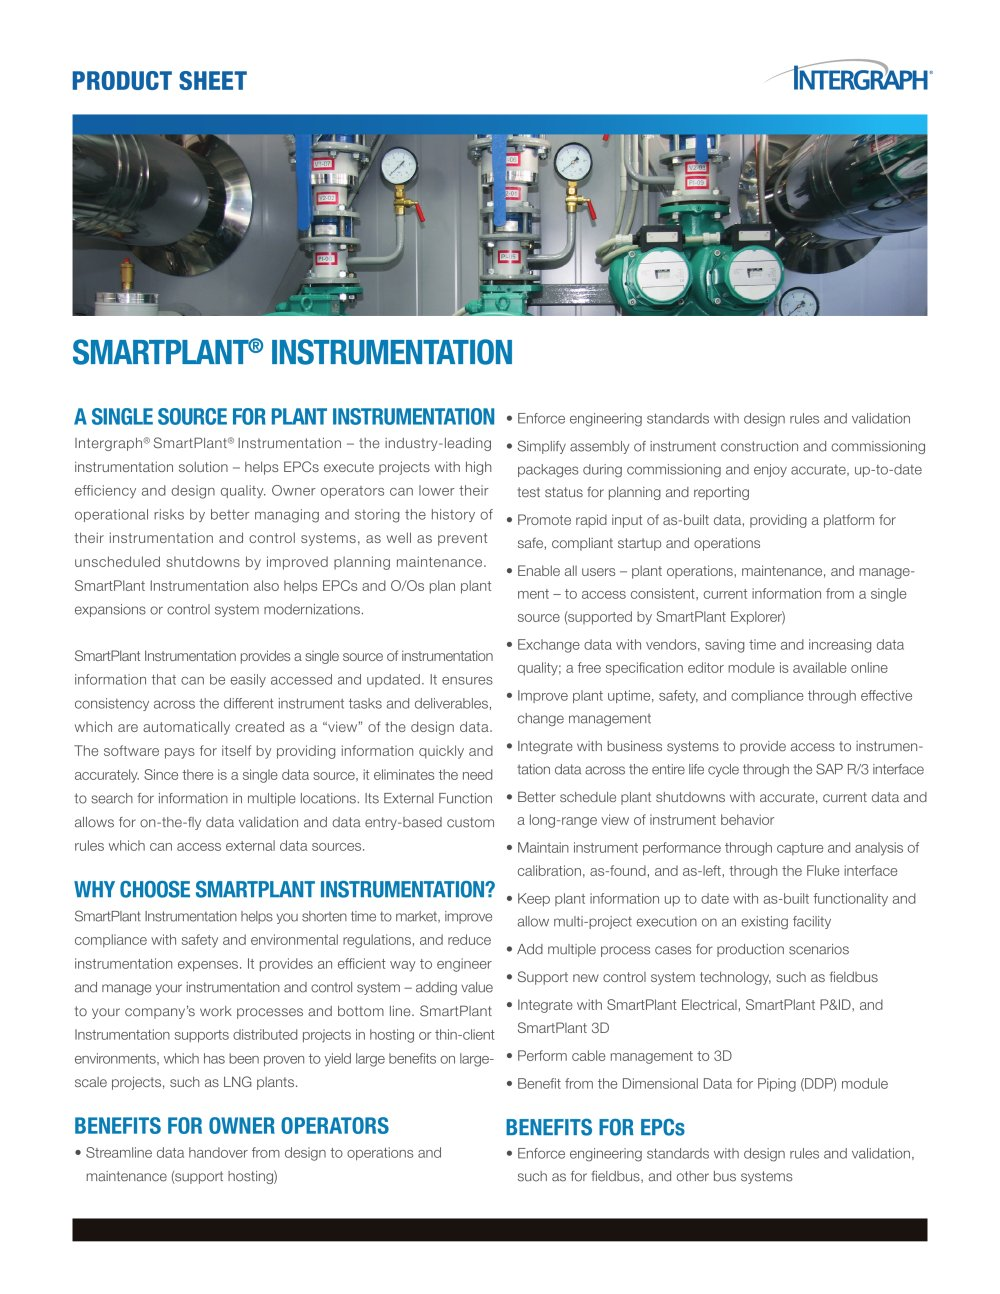 smart plant instrumentation